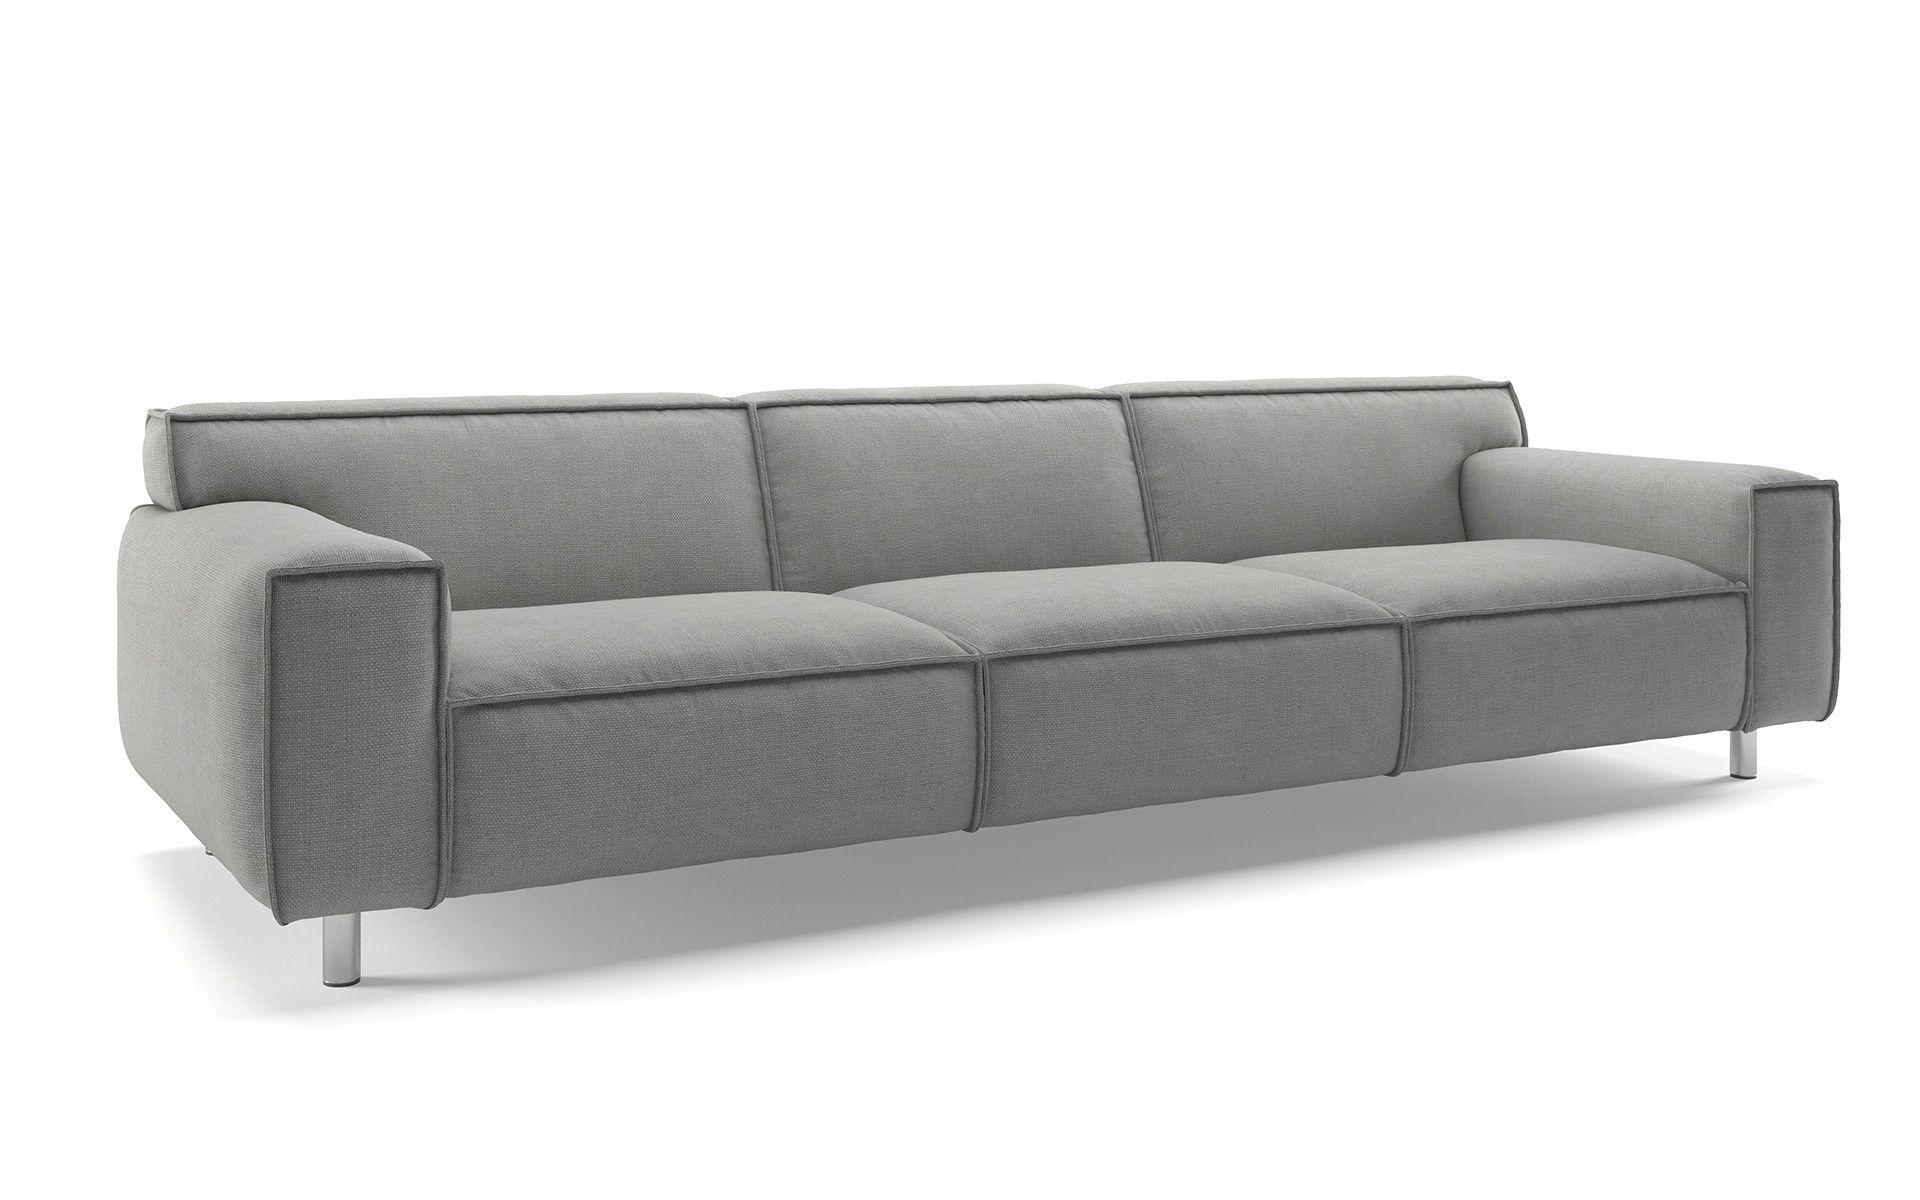 Full Size of 3er Sofa Grau Stoff Big Gebraucht Kaufen Reinigen Couch Meliert Ikea Chesterfield Grober 3 Sitzer Dreisitzer Inspirierend Hersteller Abnehmbarer Bezug Hay Mags Sofa Sofa Grau Stoff